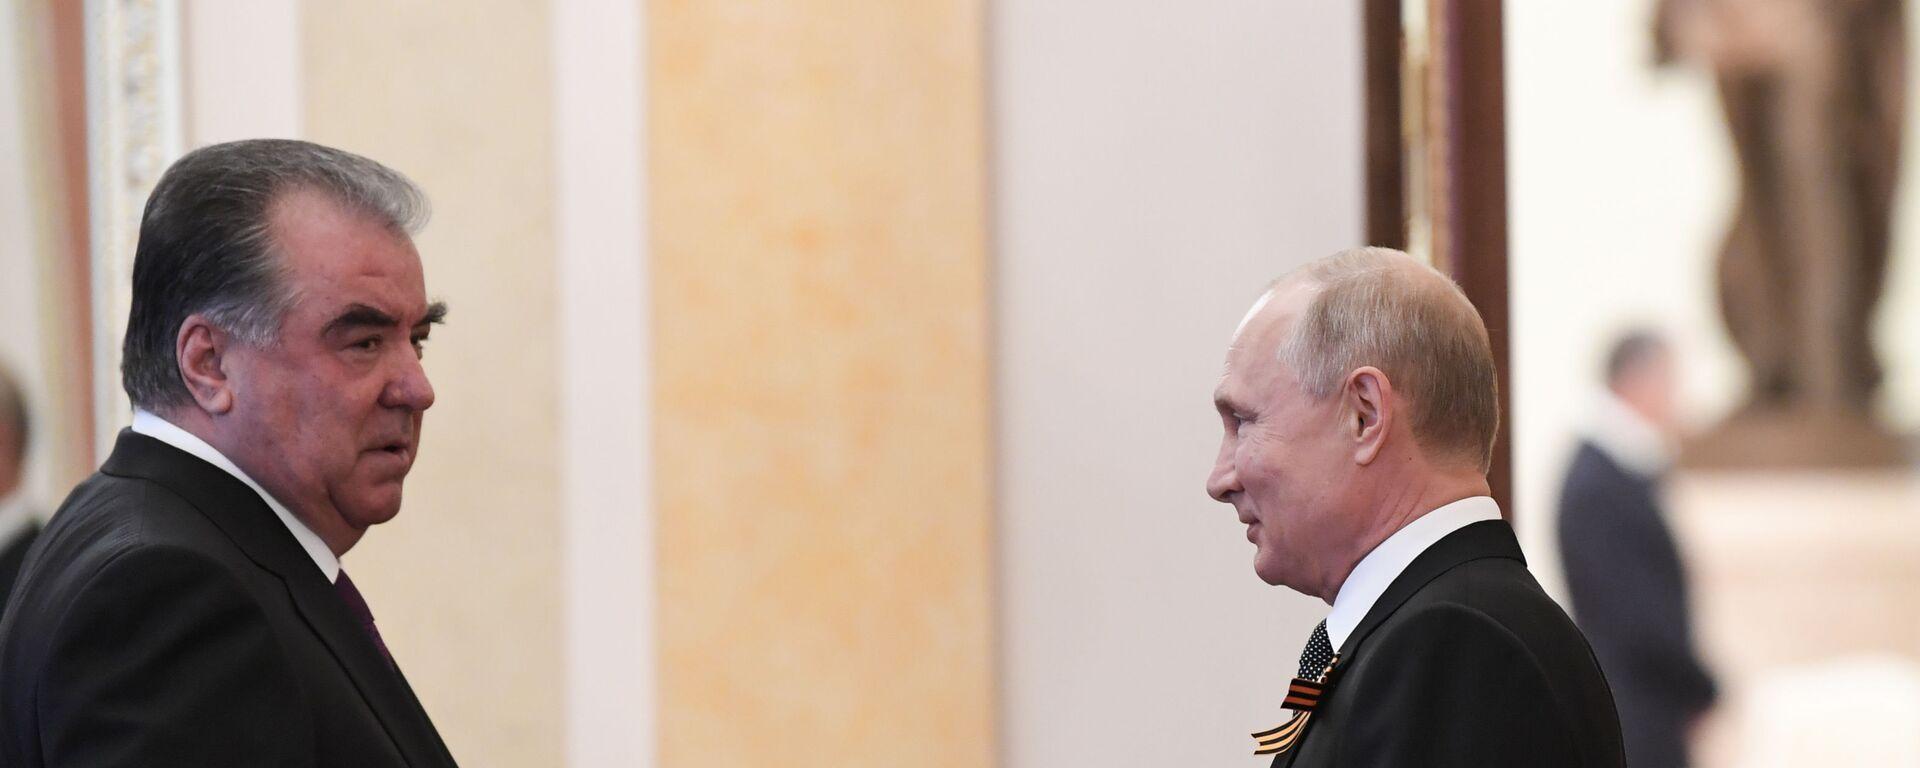 Президент России Владимир Путин и президент Таджикистана Эмомали Рахмон - Sputnik Тоҷикистон, 1920, 23.04.2021